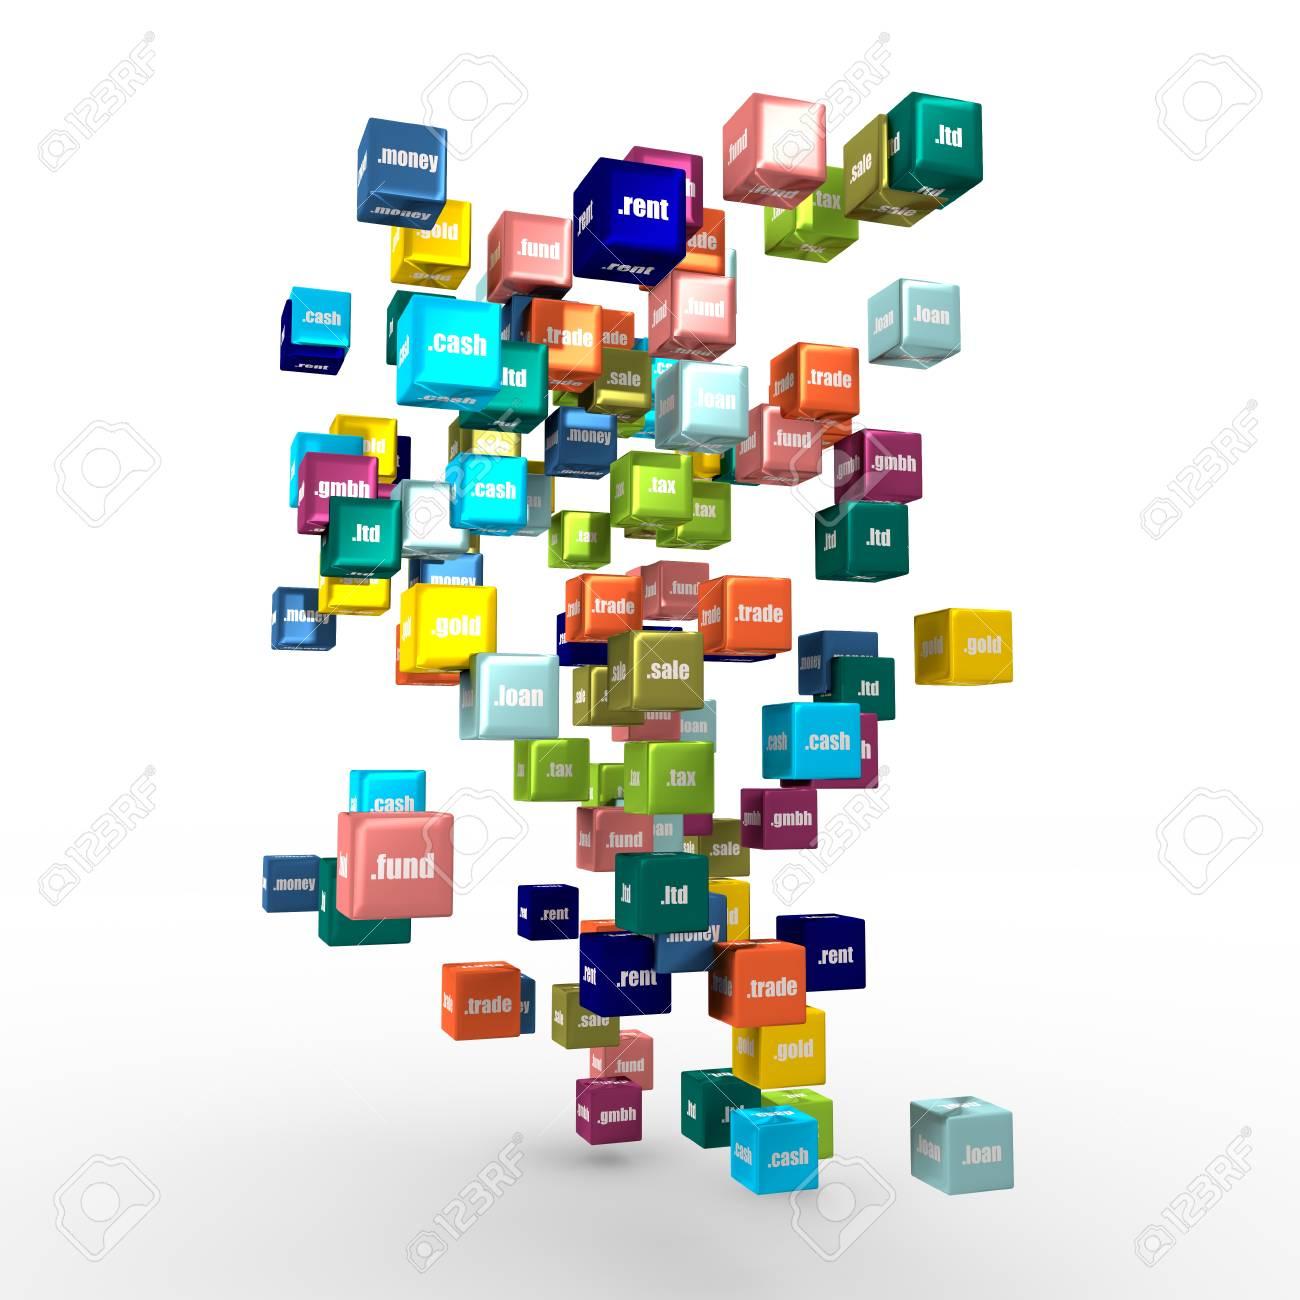 Domain names words on vibrant multicolored plastic reflective